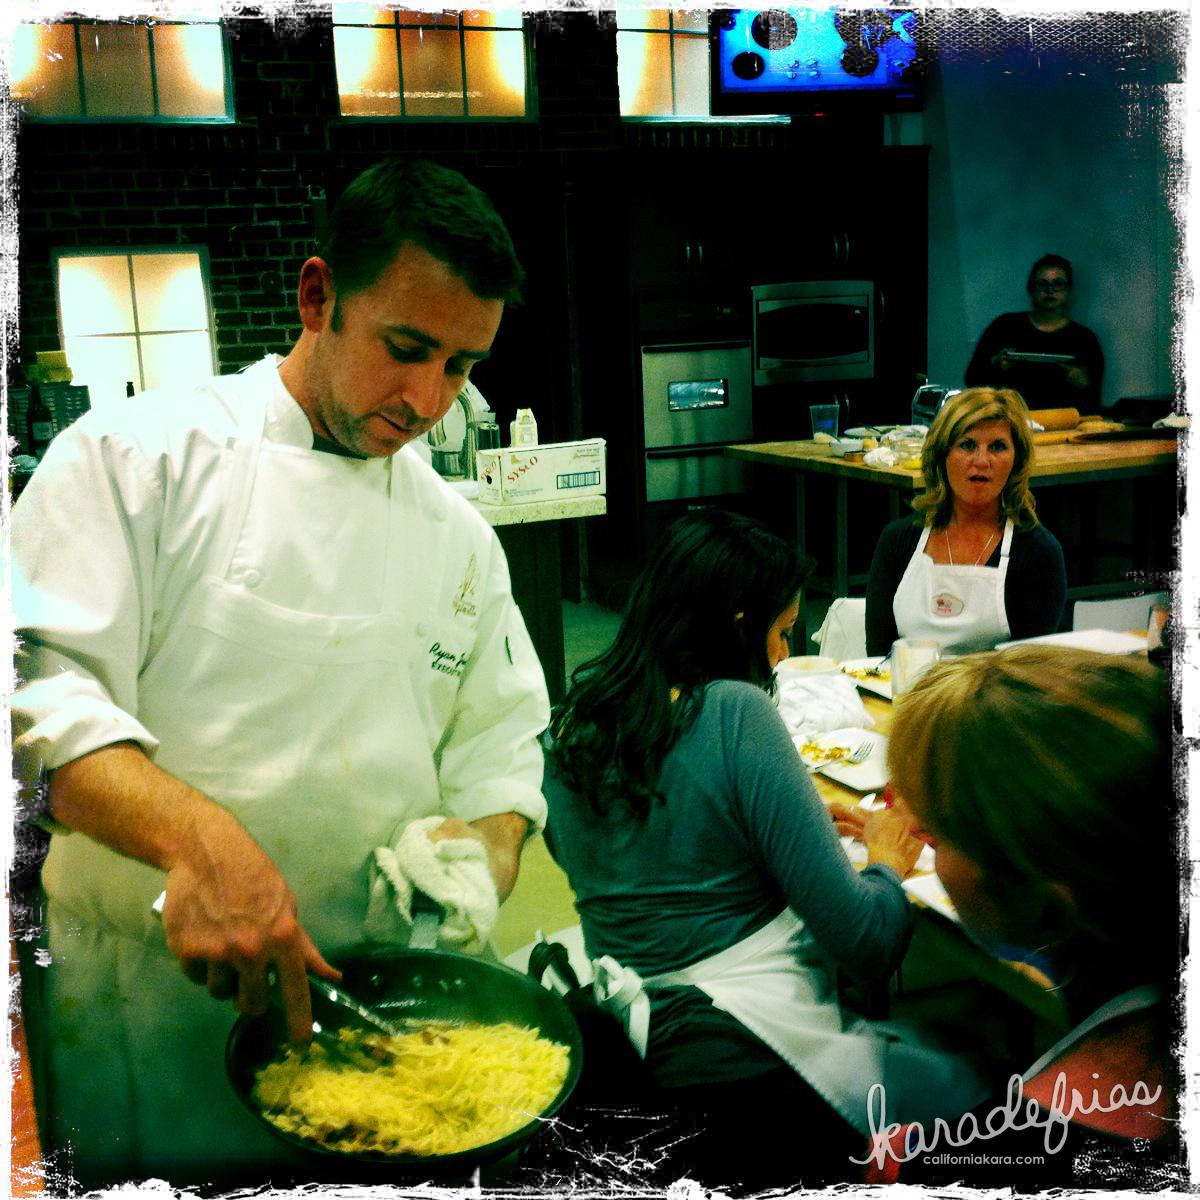 ... pastor ryan s pasta carbonara recipes dishmaps pastor ryan s pasta